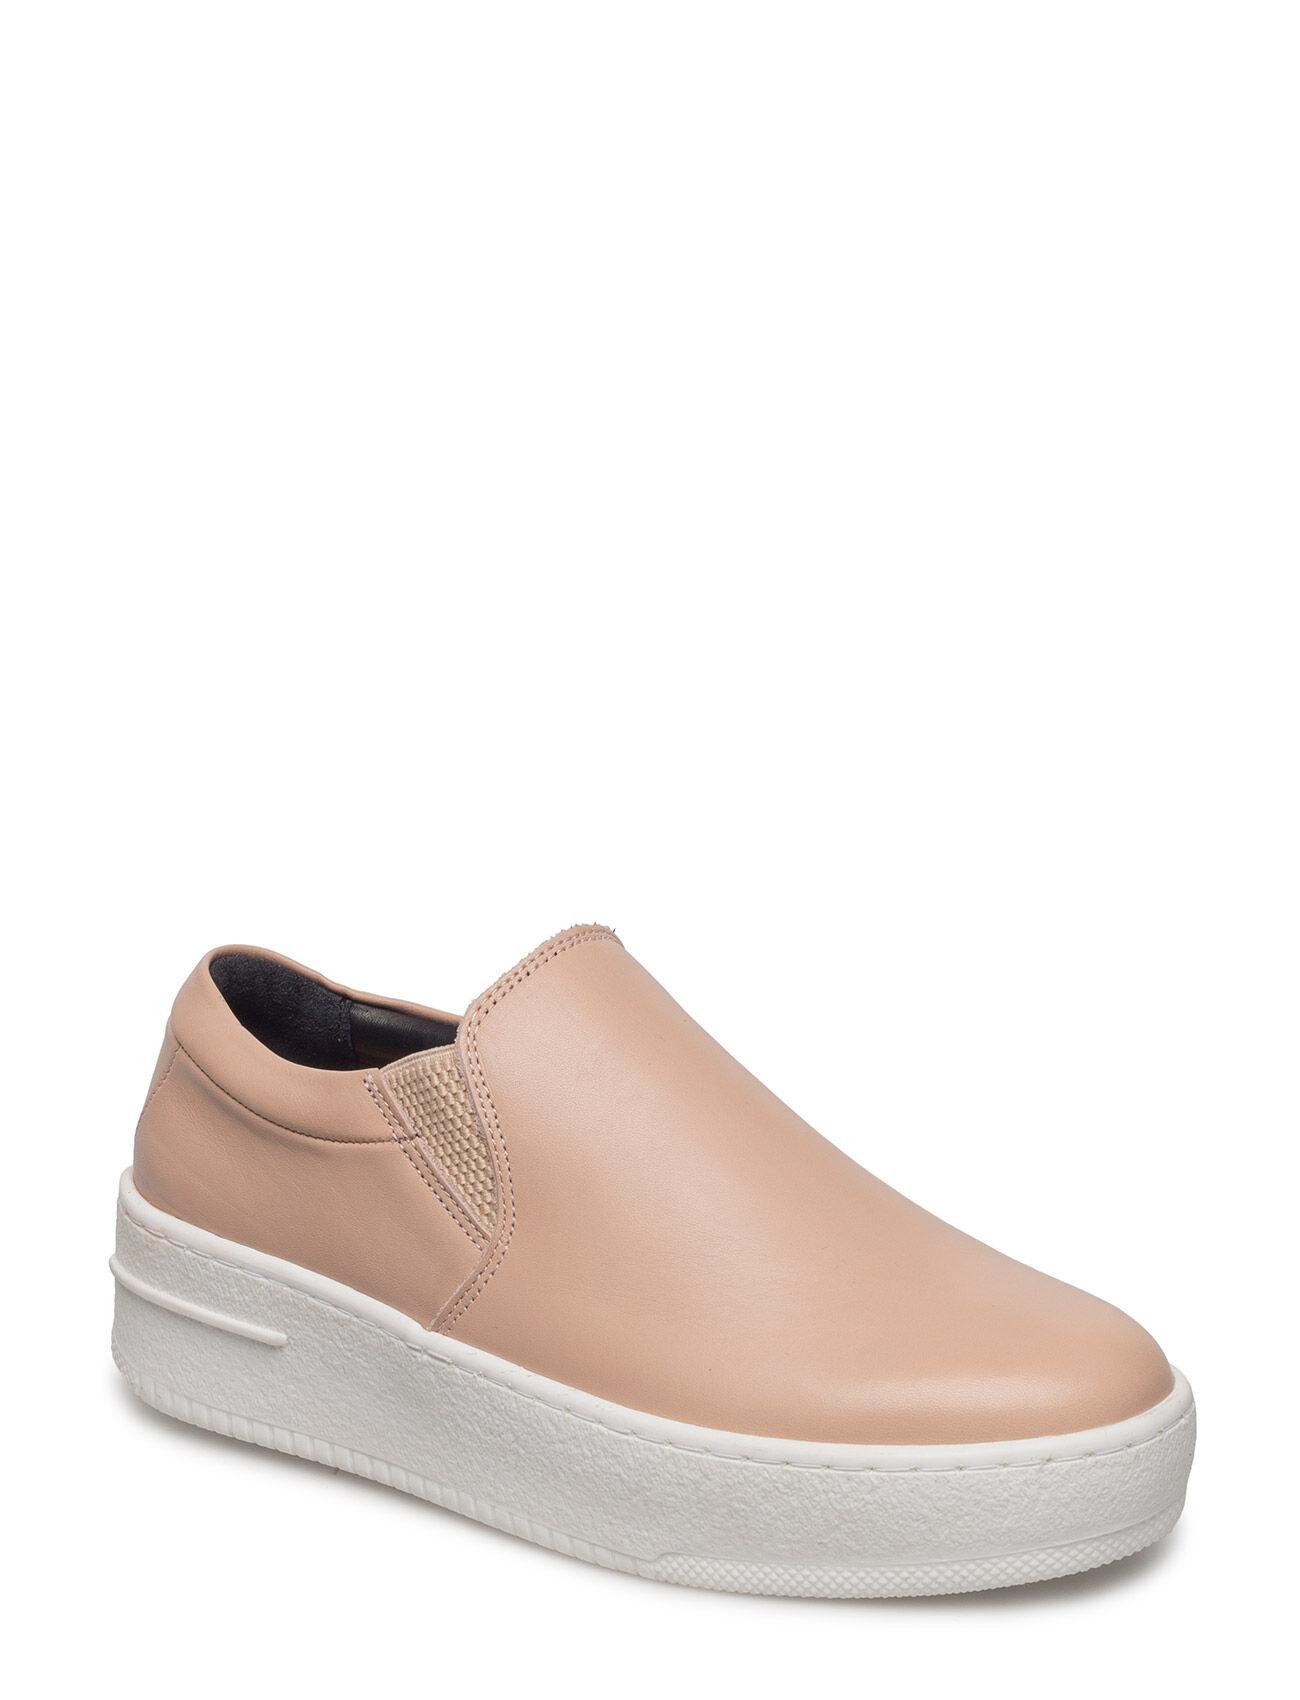 Royal RepubliQ Seven20 Loafer